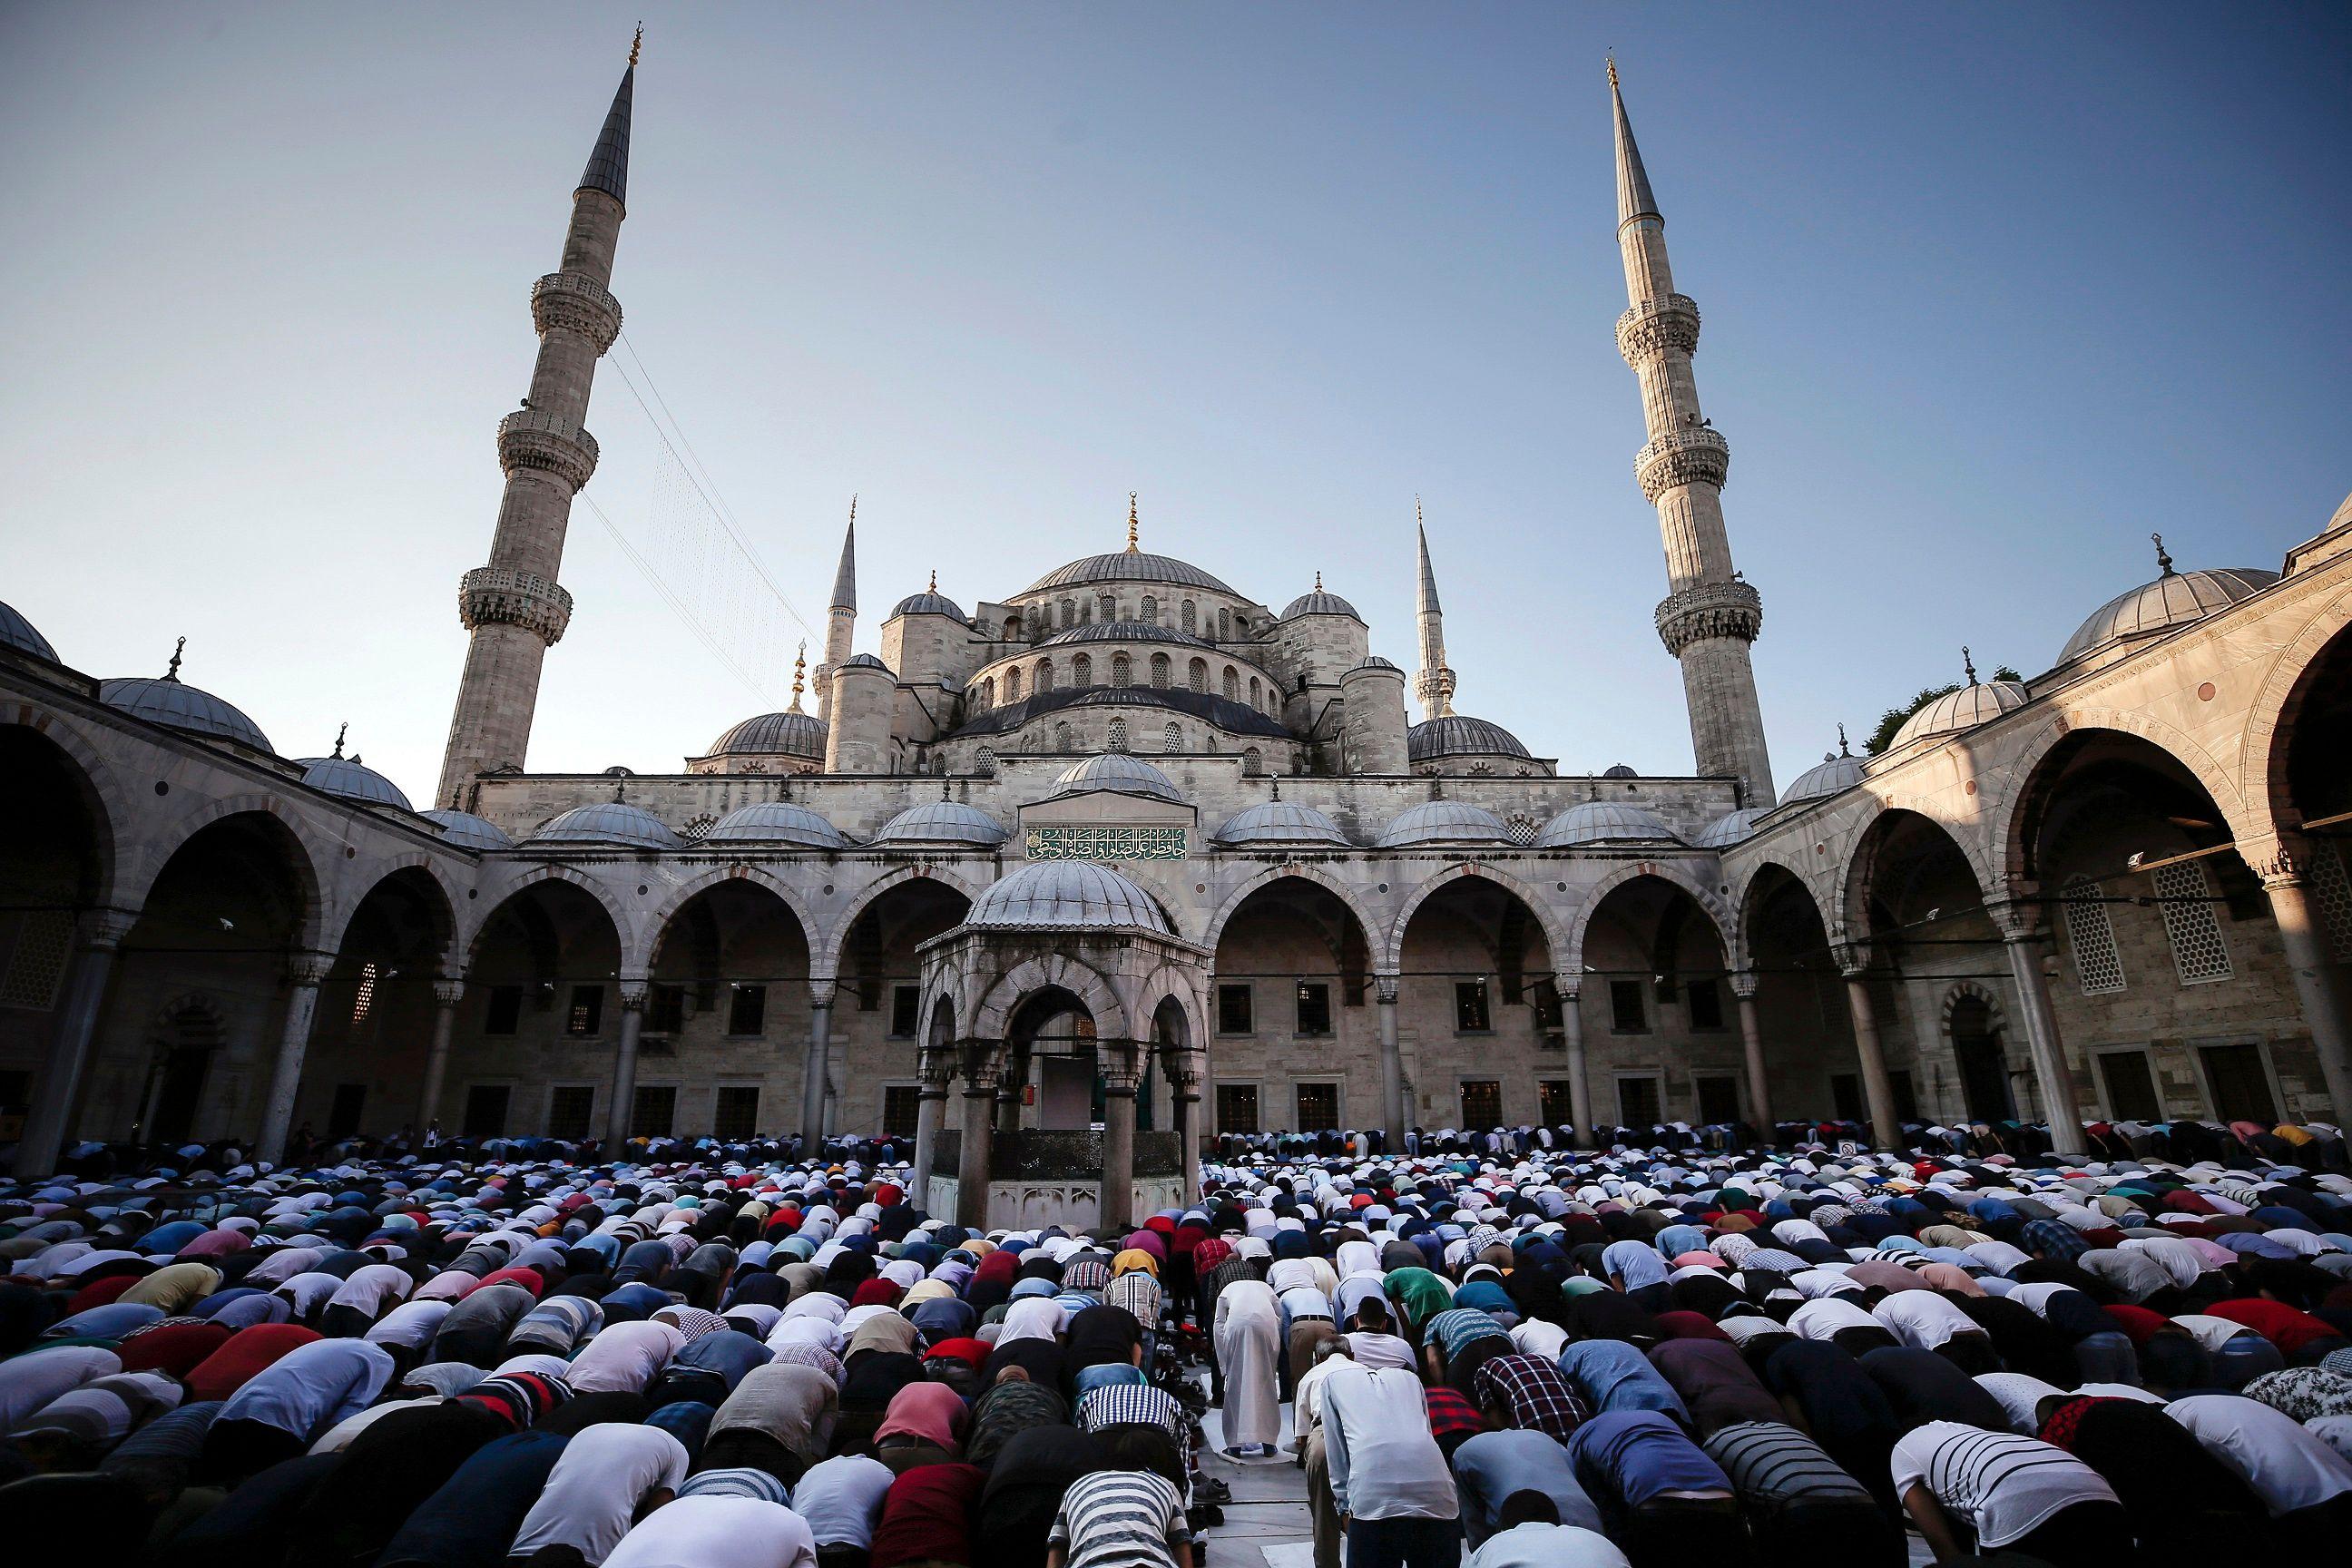 Muslims around the world celebrate Eid al-Fitr, bringing Ramadan to a close